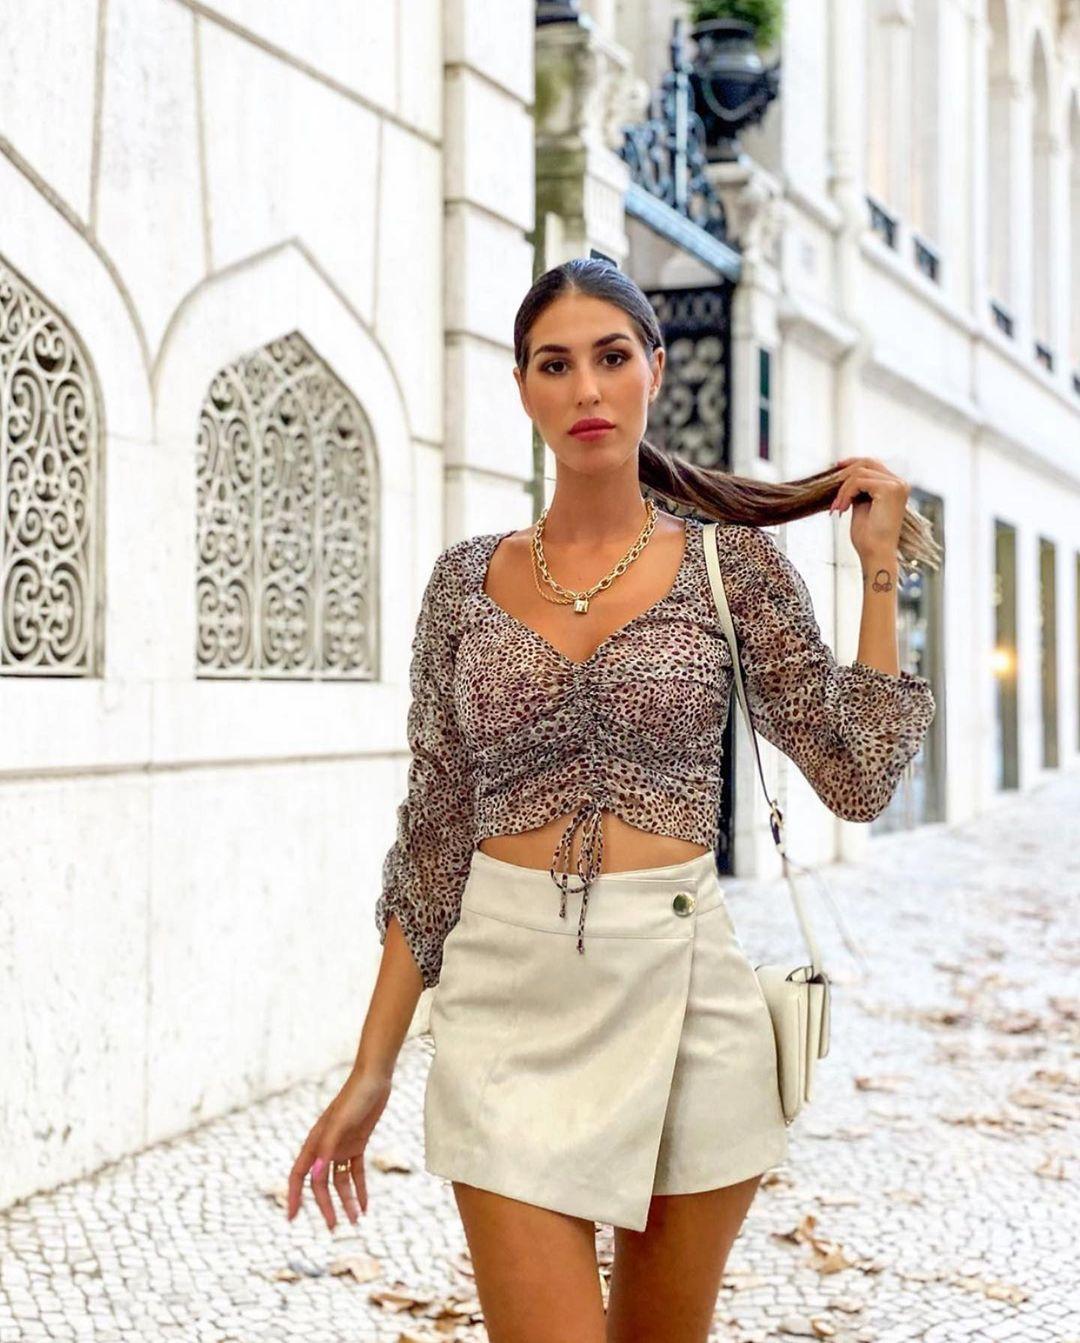 jupe-short en cuir synthétique de Zara sur zara.outfits